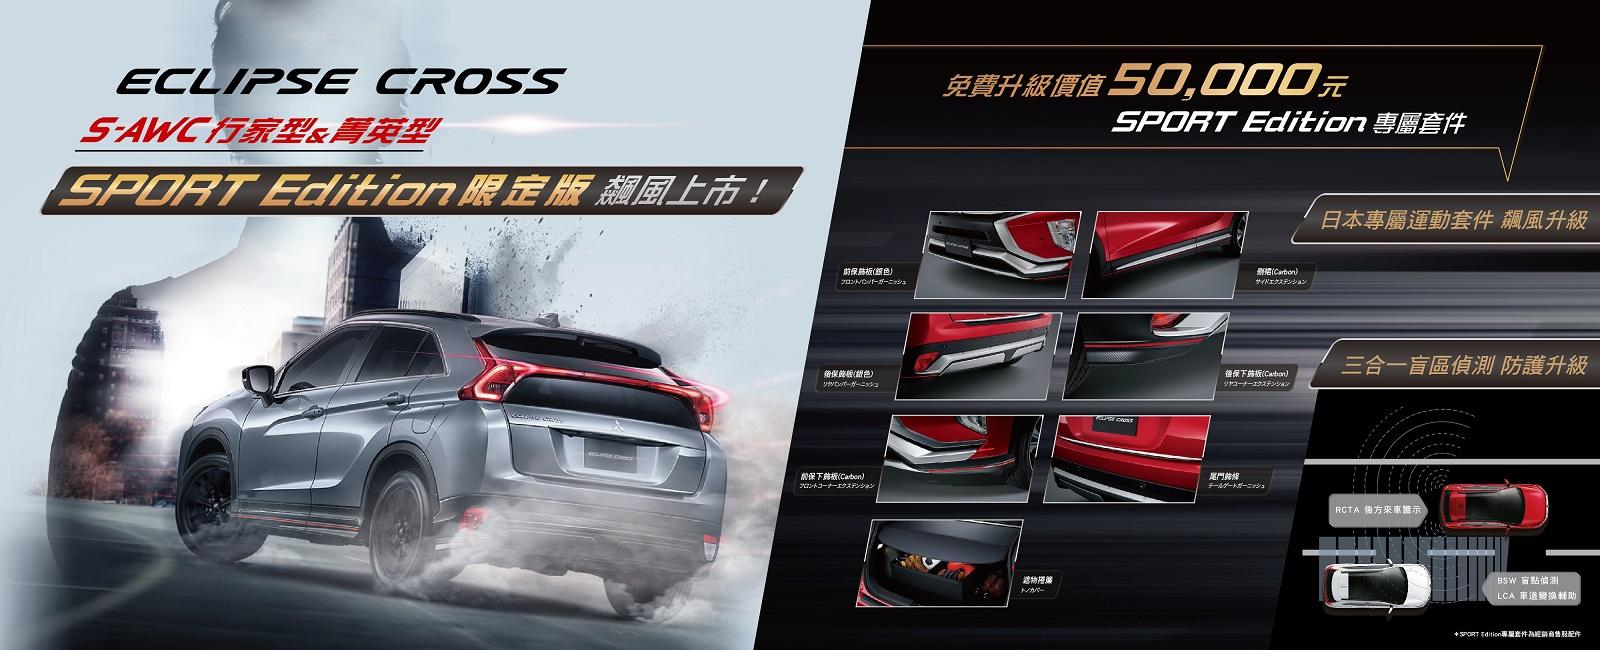 Mitsubishi Eclipse Cross 9 月推出 Sport Edition 限定版特仕車。